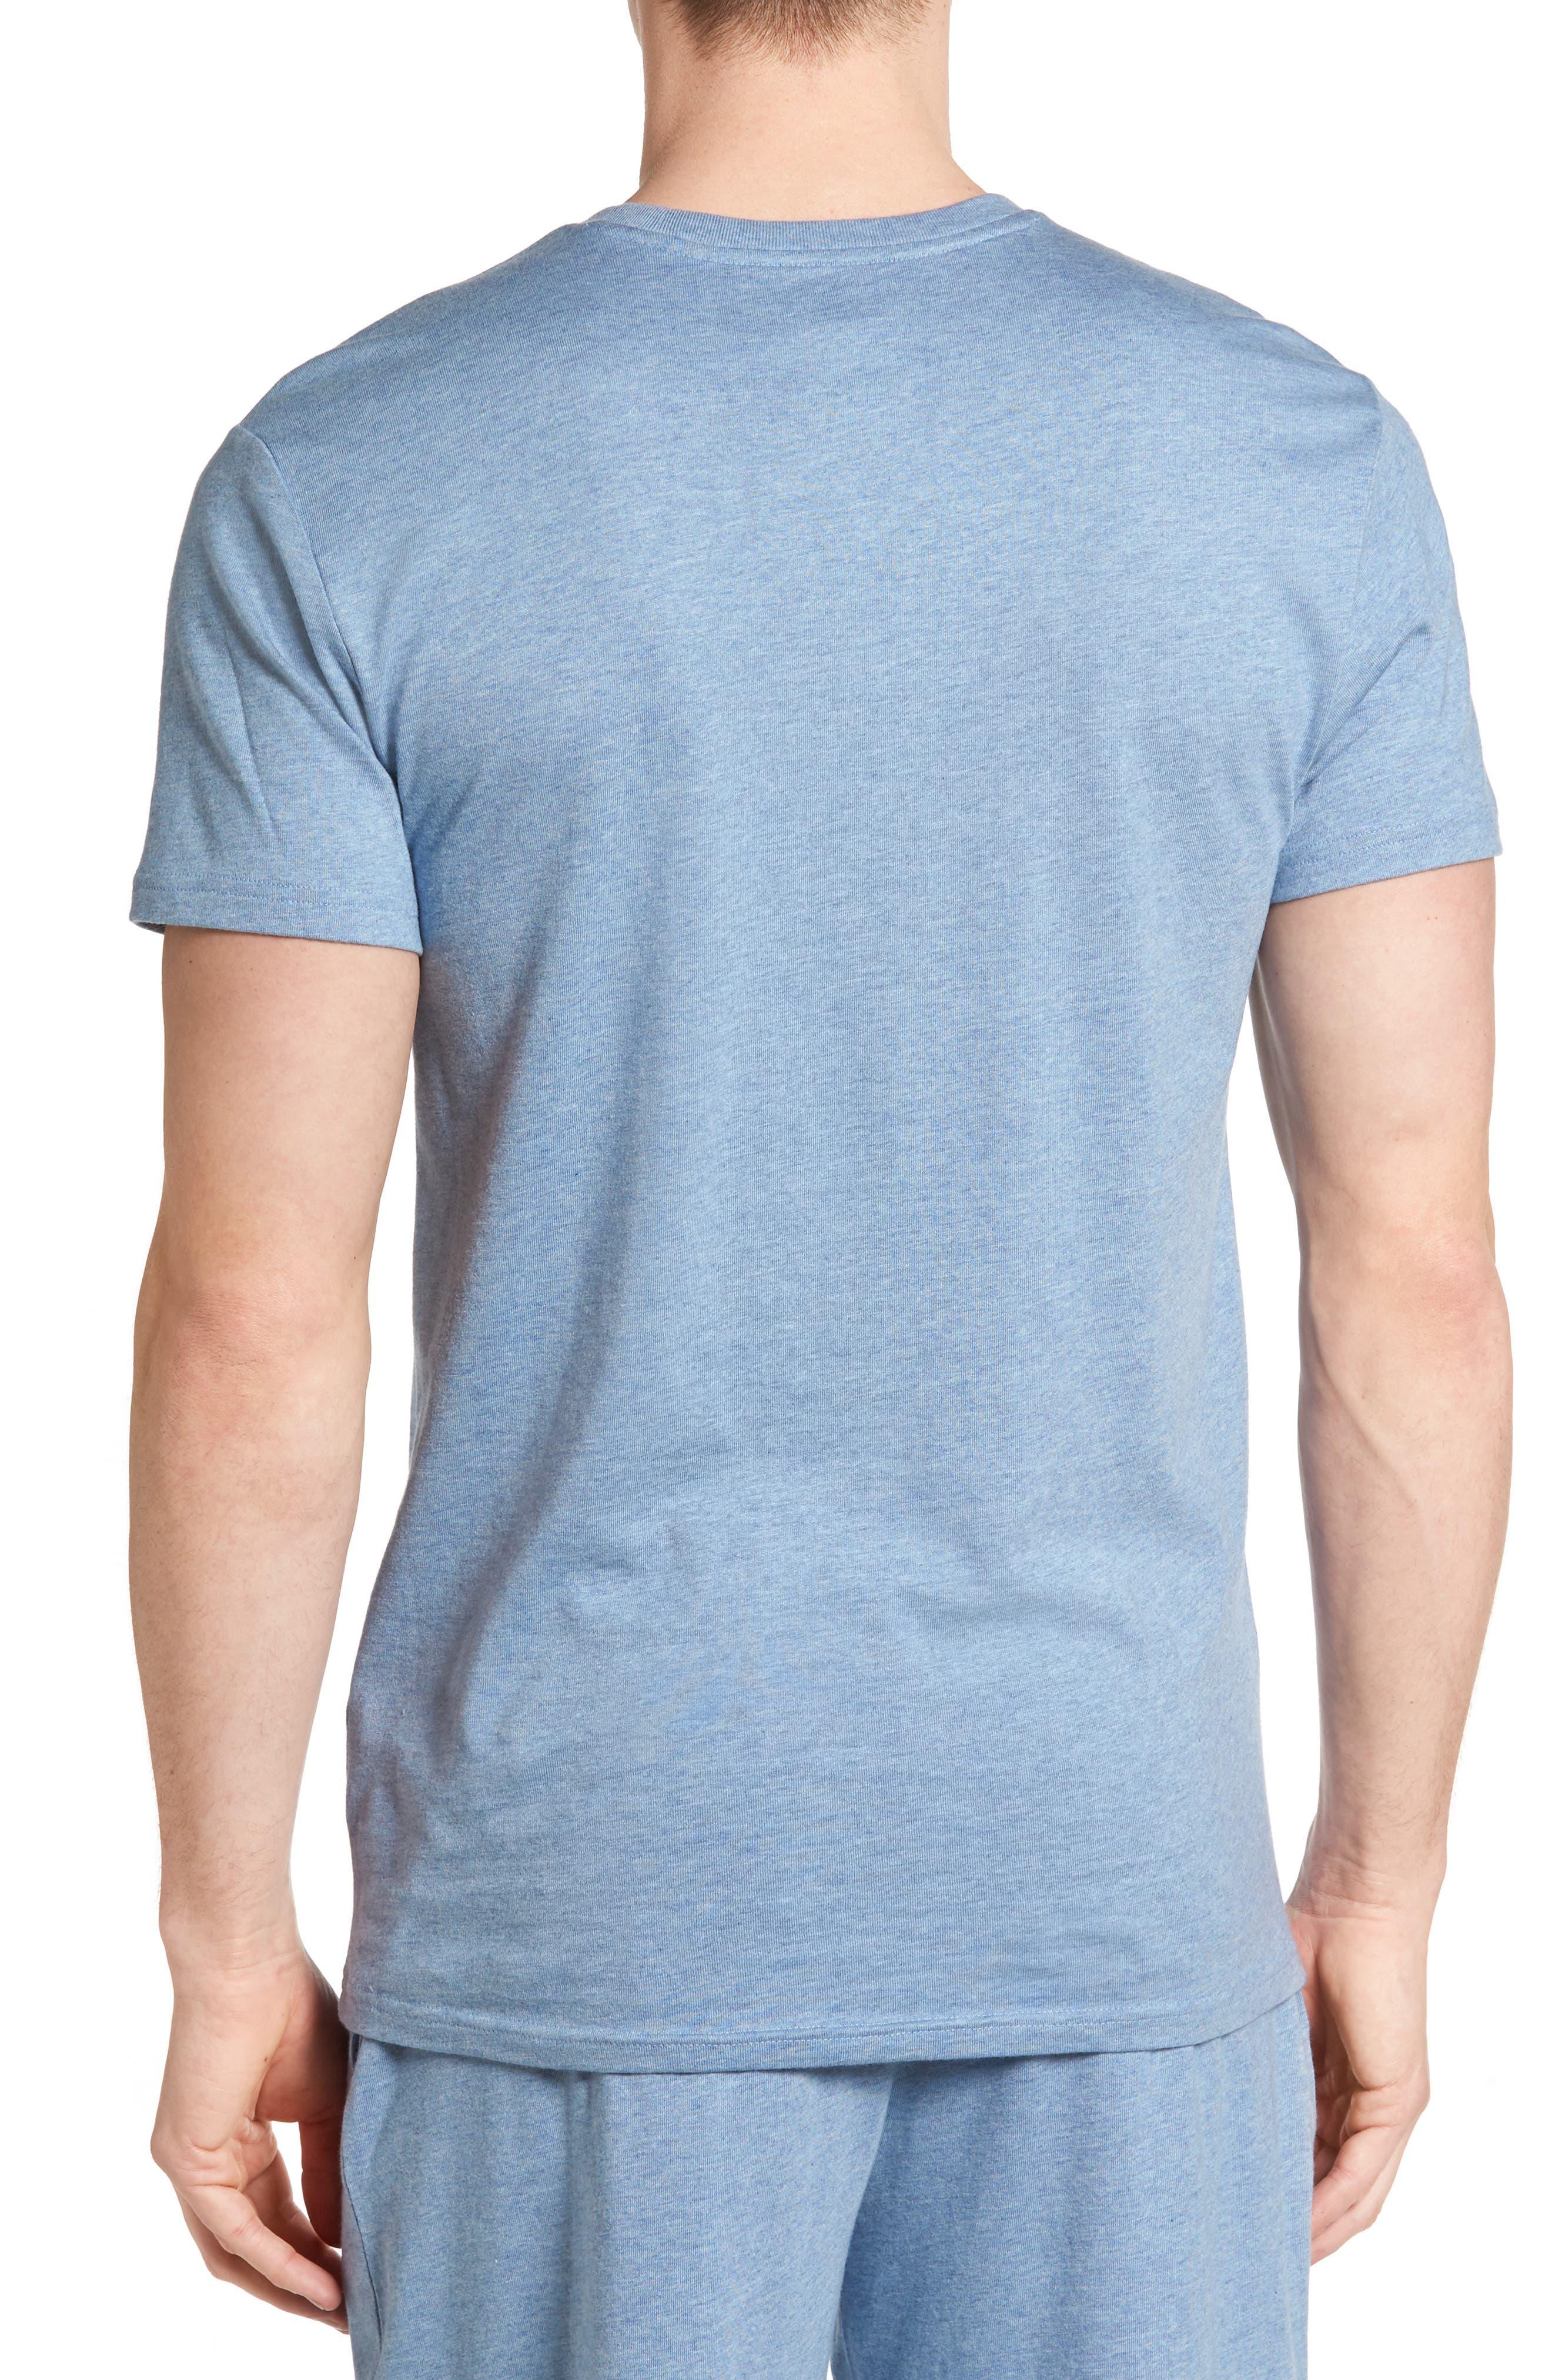 Alternate Image 2  - Polo Ralph Lauren Crewneck Cotton & Modal T-Shirt